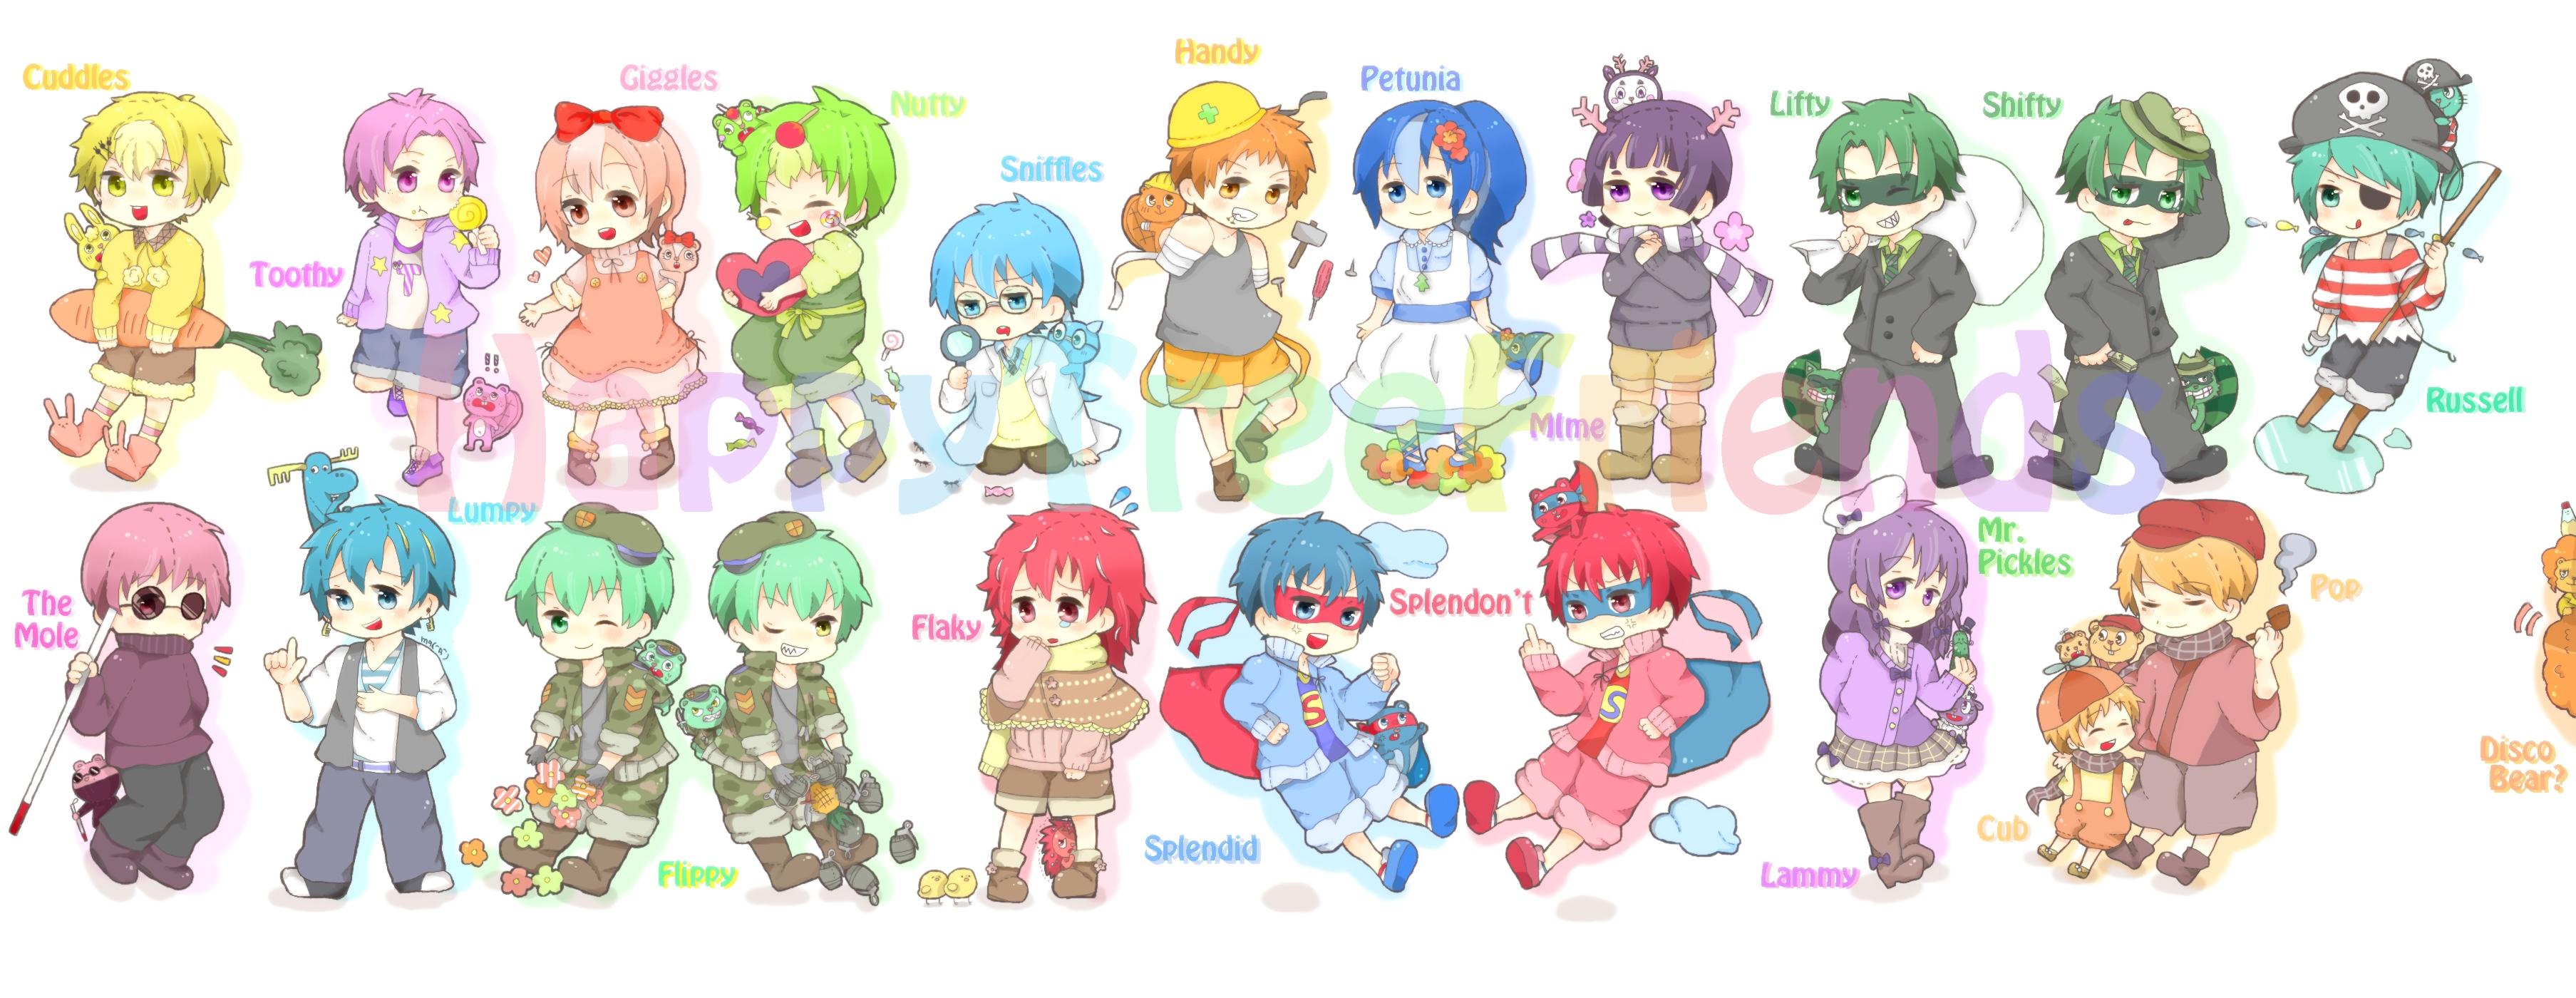 Amputee | page 5 of 42 - Zerochan Anime Image Board